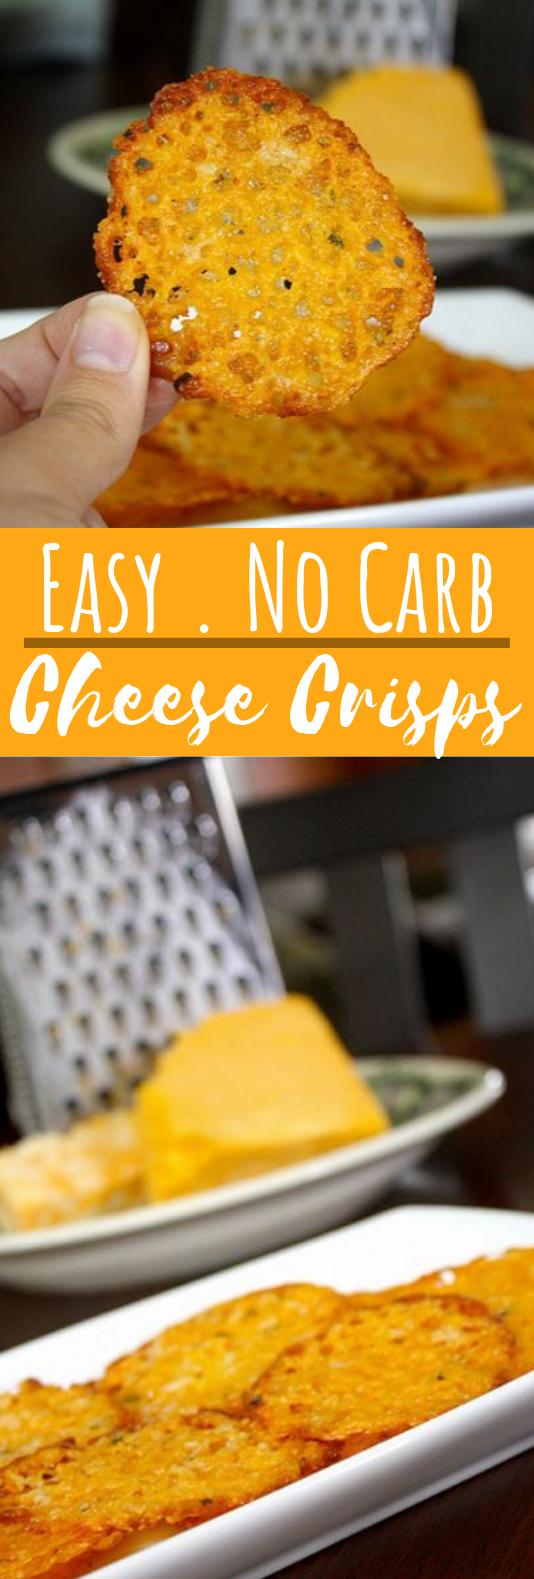 Homemade Baked Cheese Crisps #healthy #keto